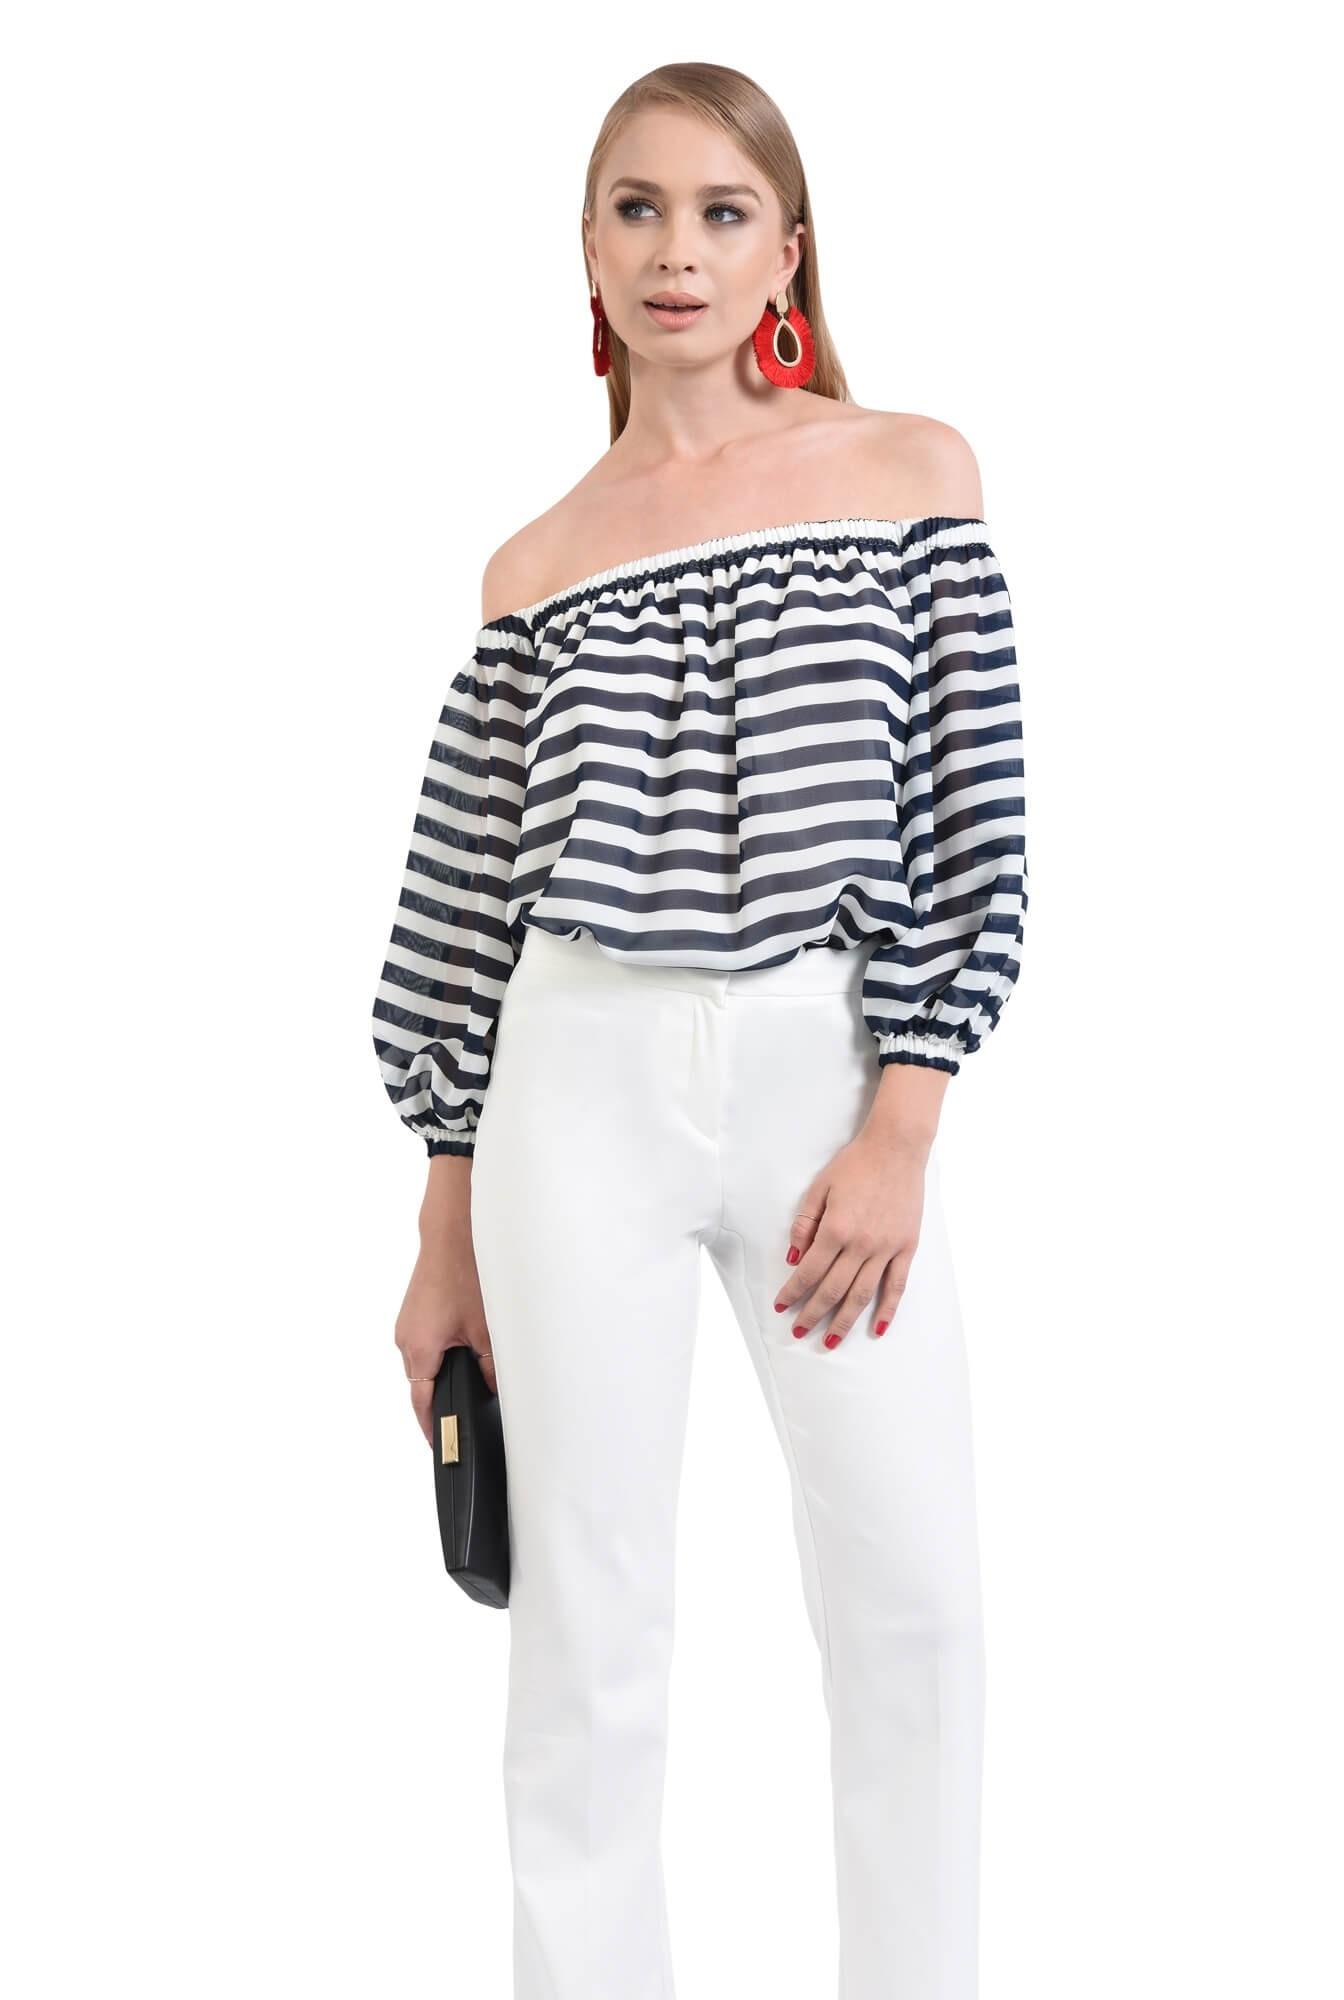 bluza eleganta cu dungi, alb, bleumarin, decolteu elastic, sifon, maneci lungi